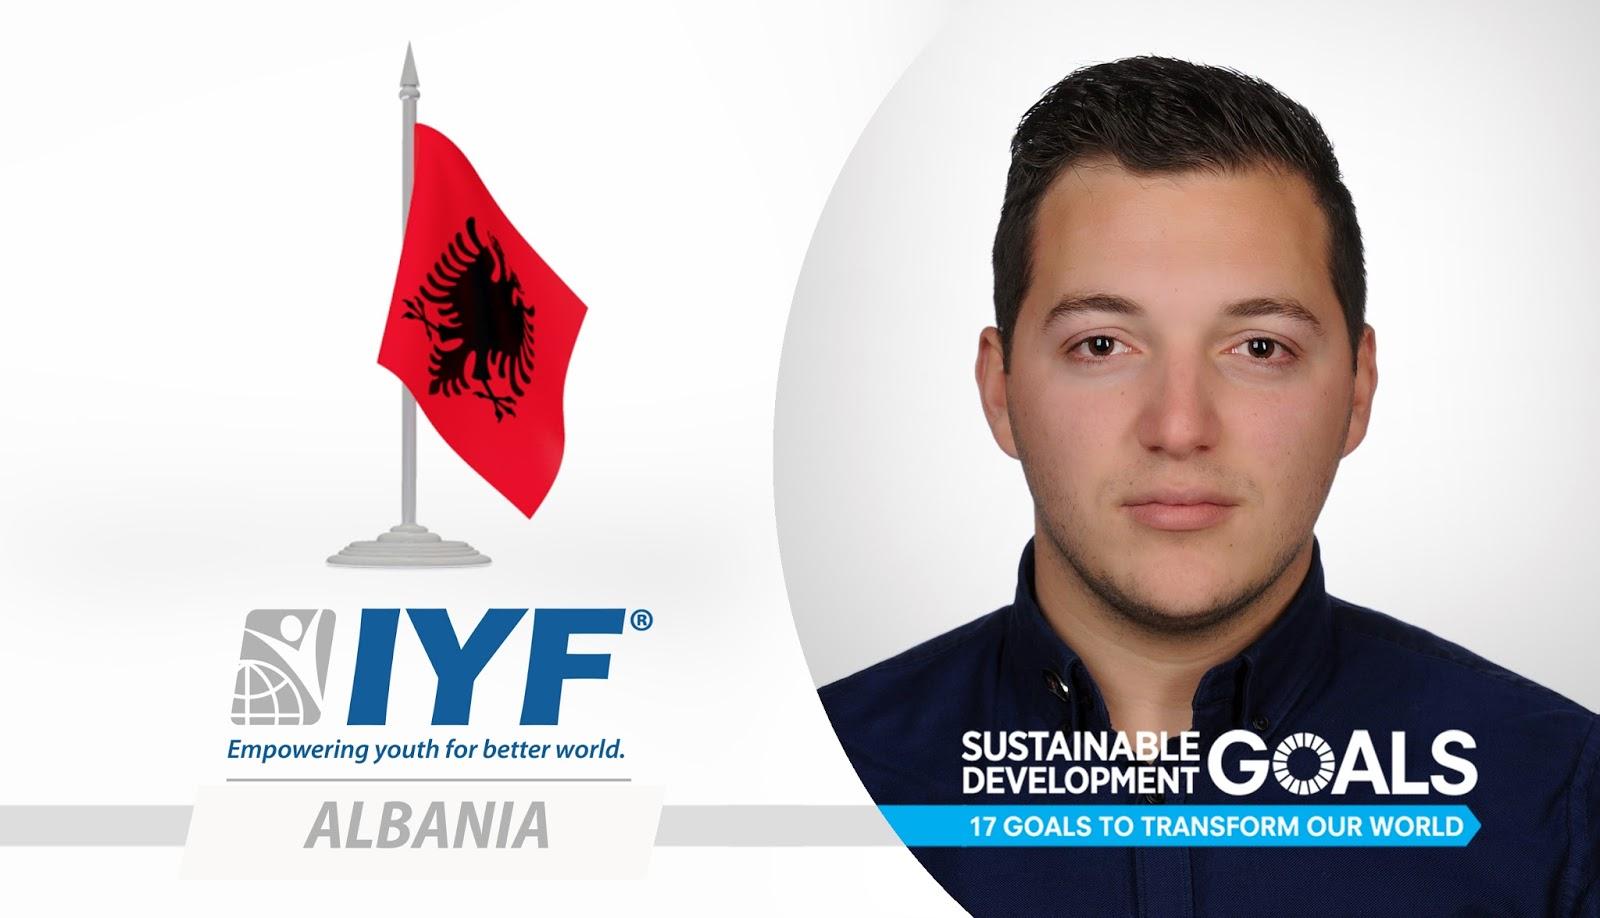 Marilo Meta, IYF Representative in Albania